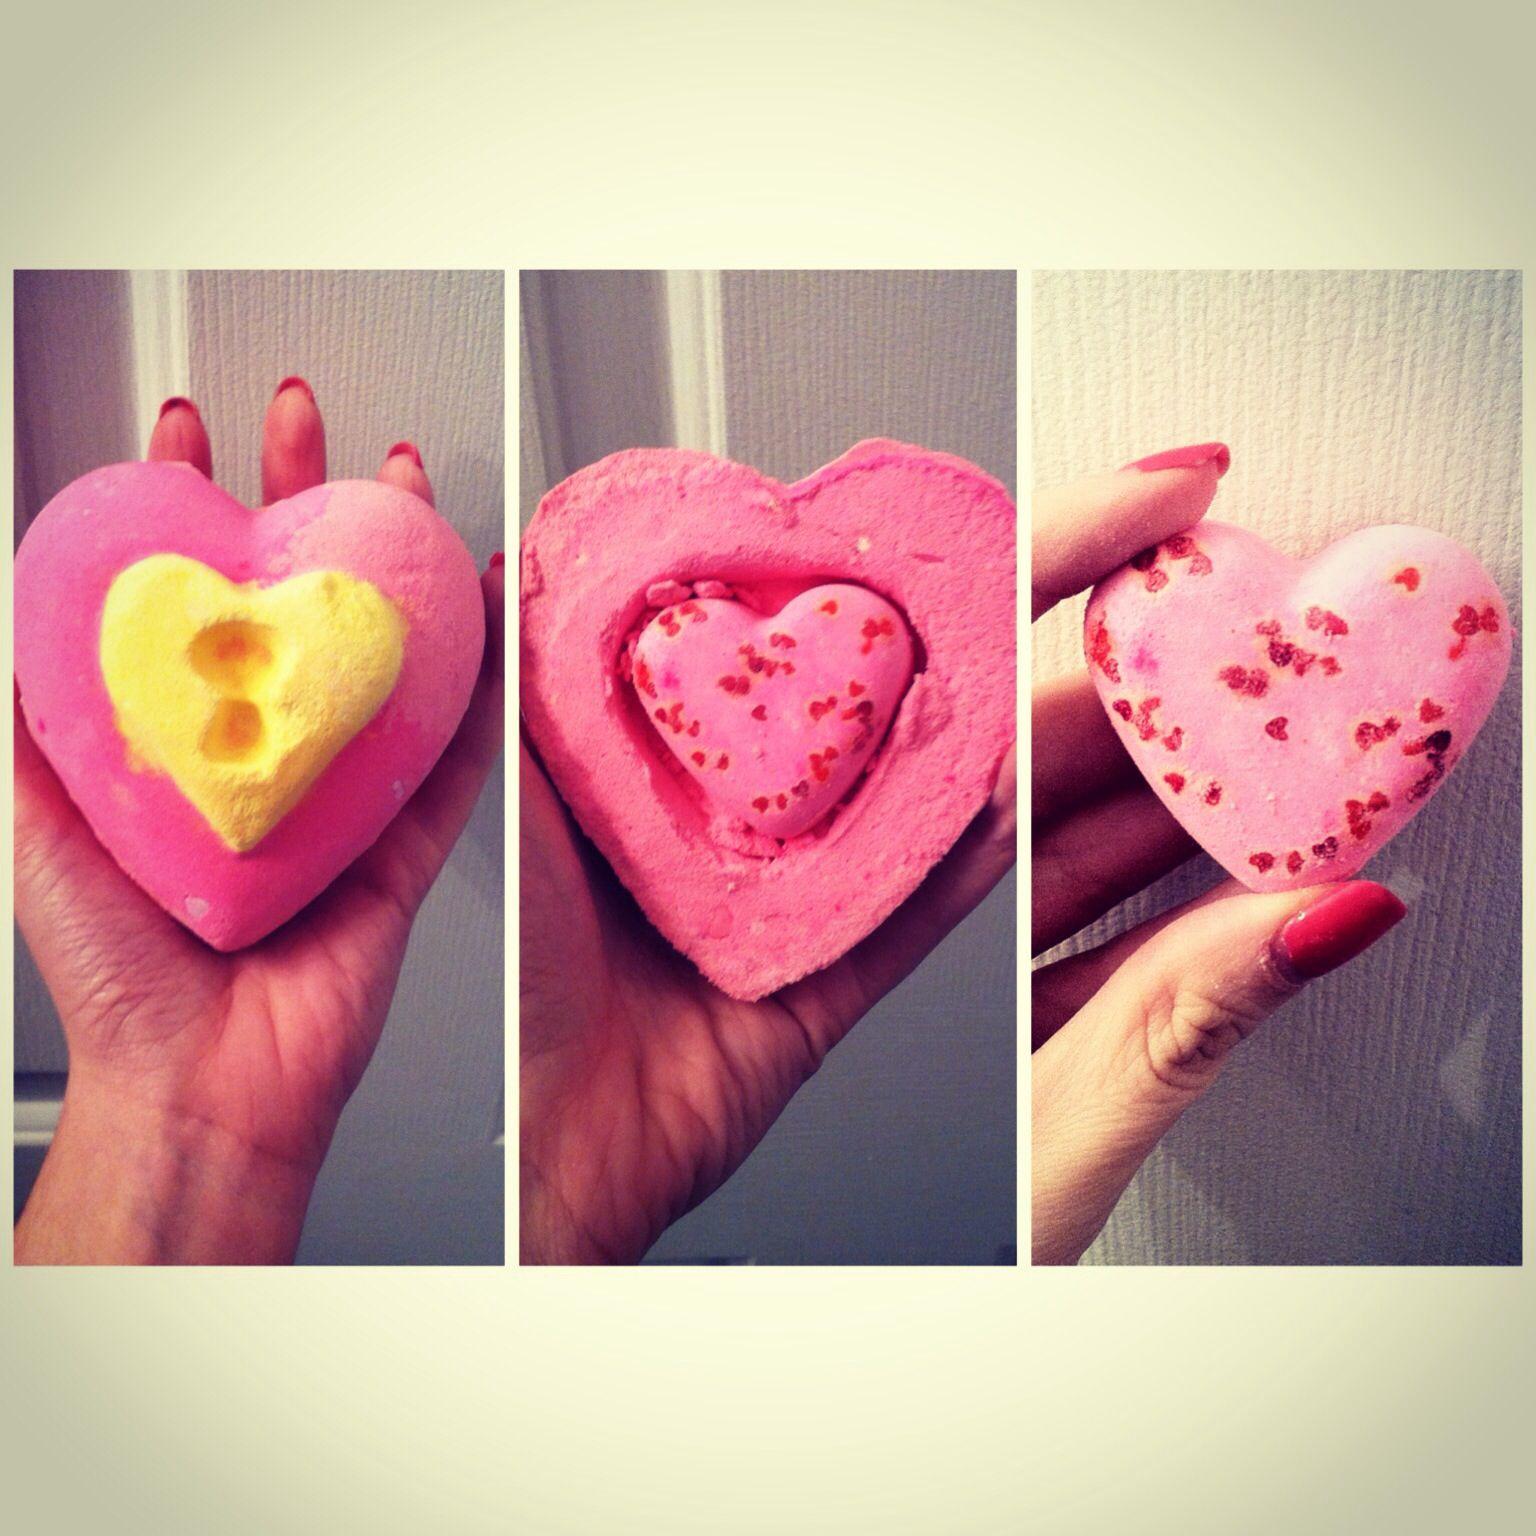 Love Locket bath bomb from Lush Cosmetics. / Valentines day limited edition / jasmine and vanilla.